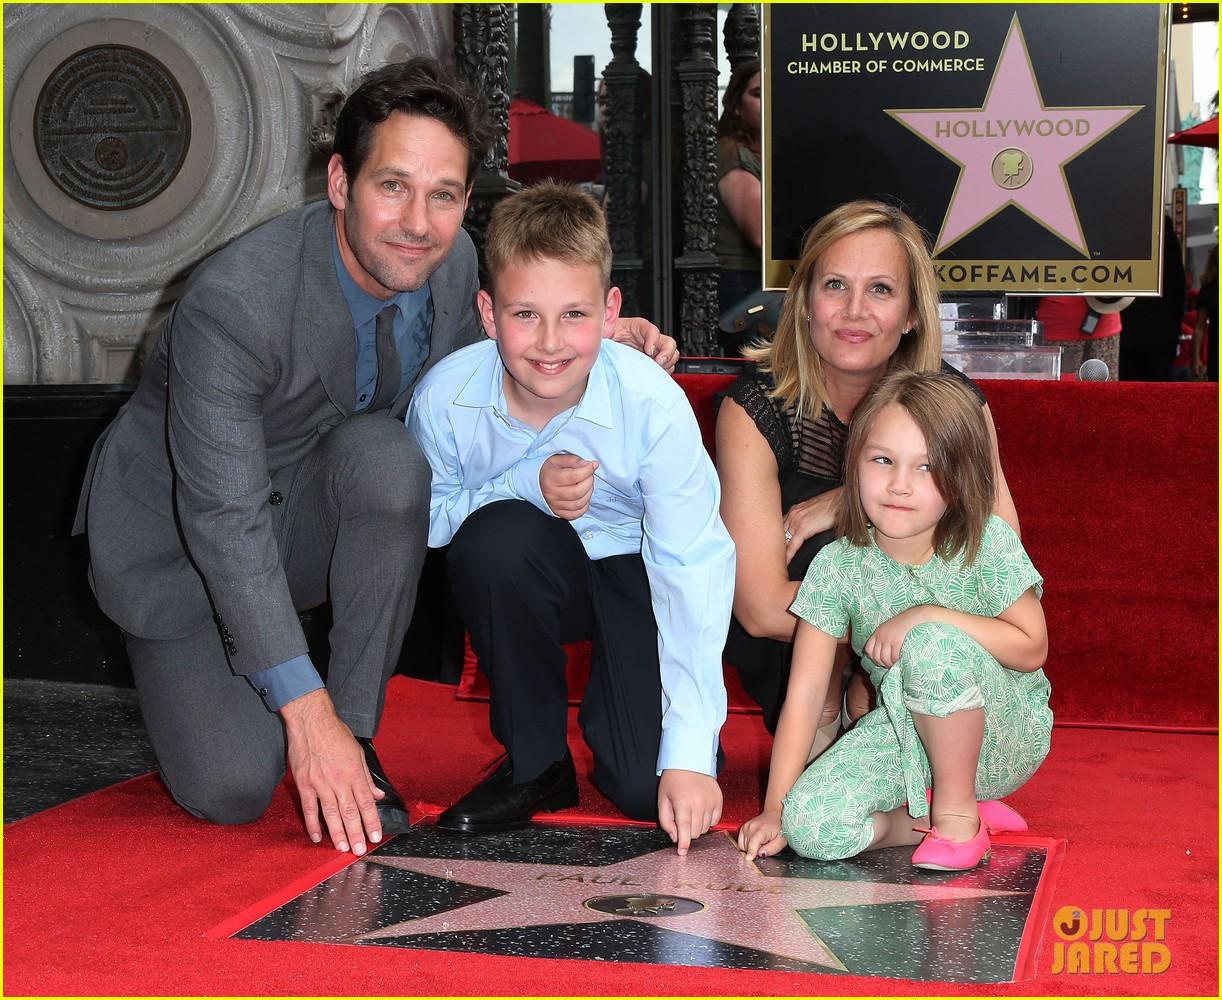 http://cdn01.cdn.justjared.com/wp-content/uploads/2015/07/paul-farts/paul-rudd-hollywood-walk-of-fame-star-03.jpg